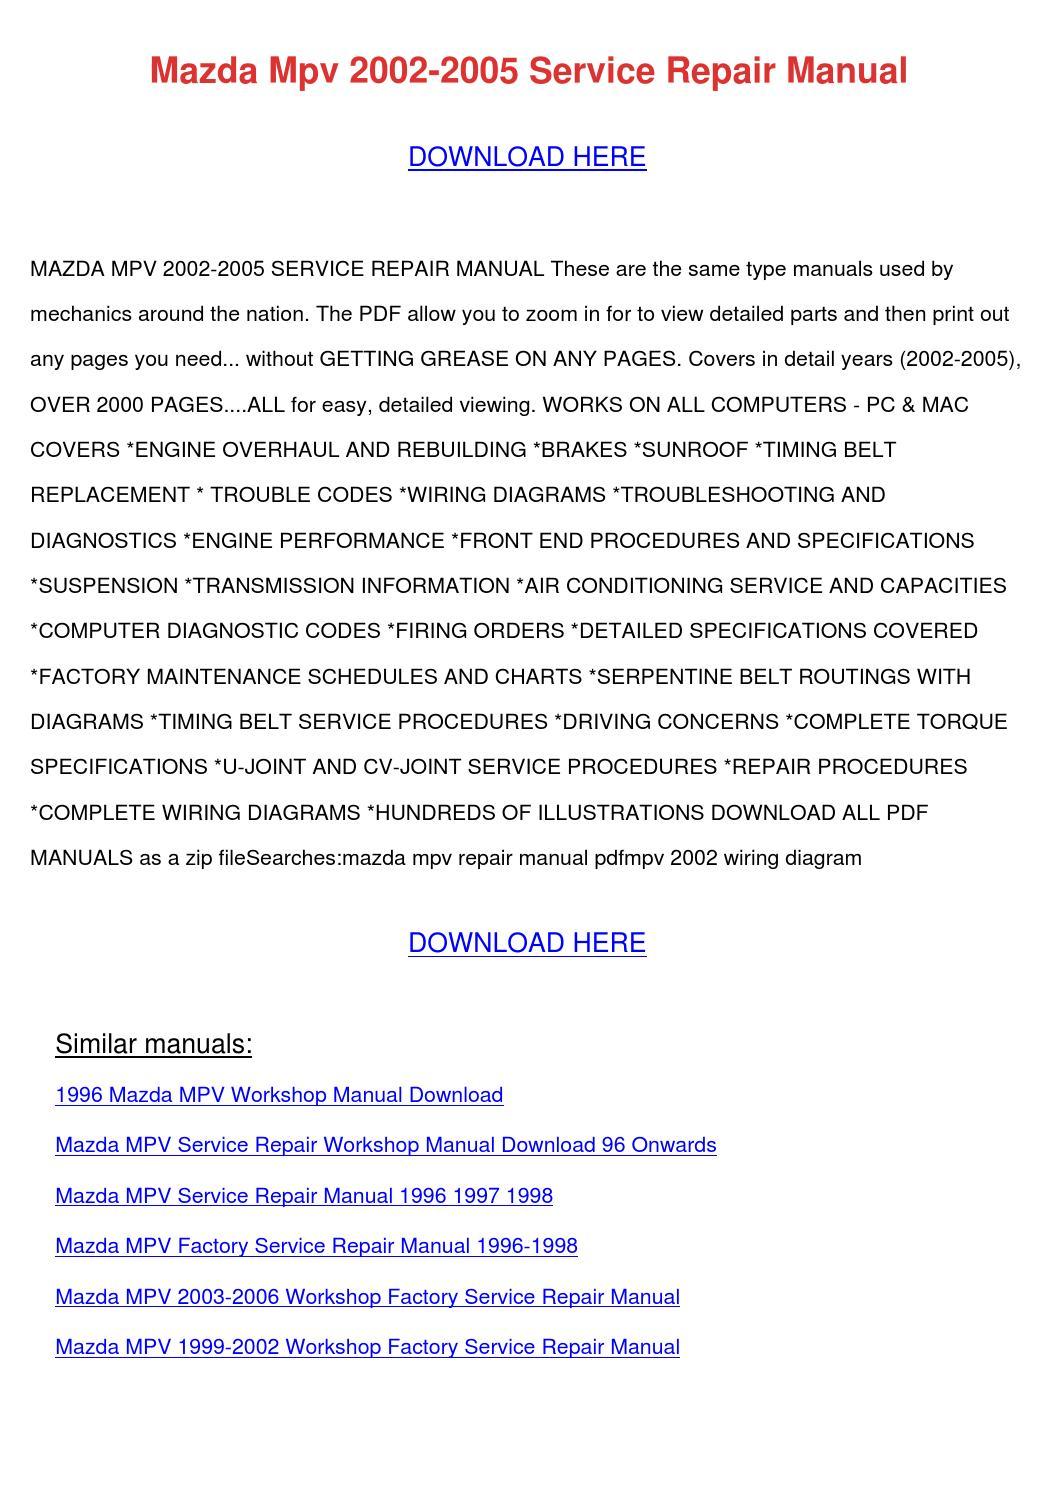 6985ae 200 Mazda Mpv Workshop Manual Wiring Diagram Library